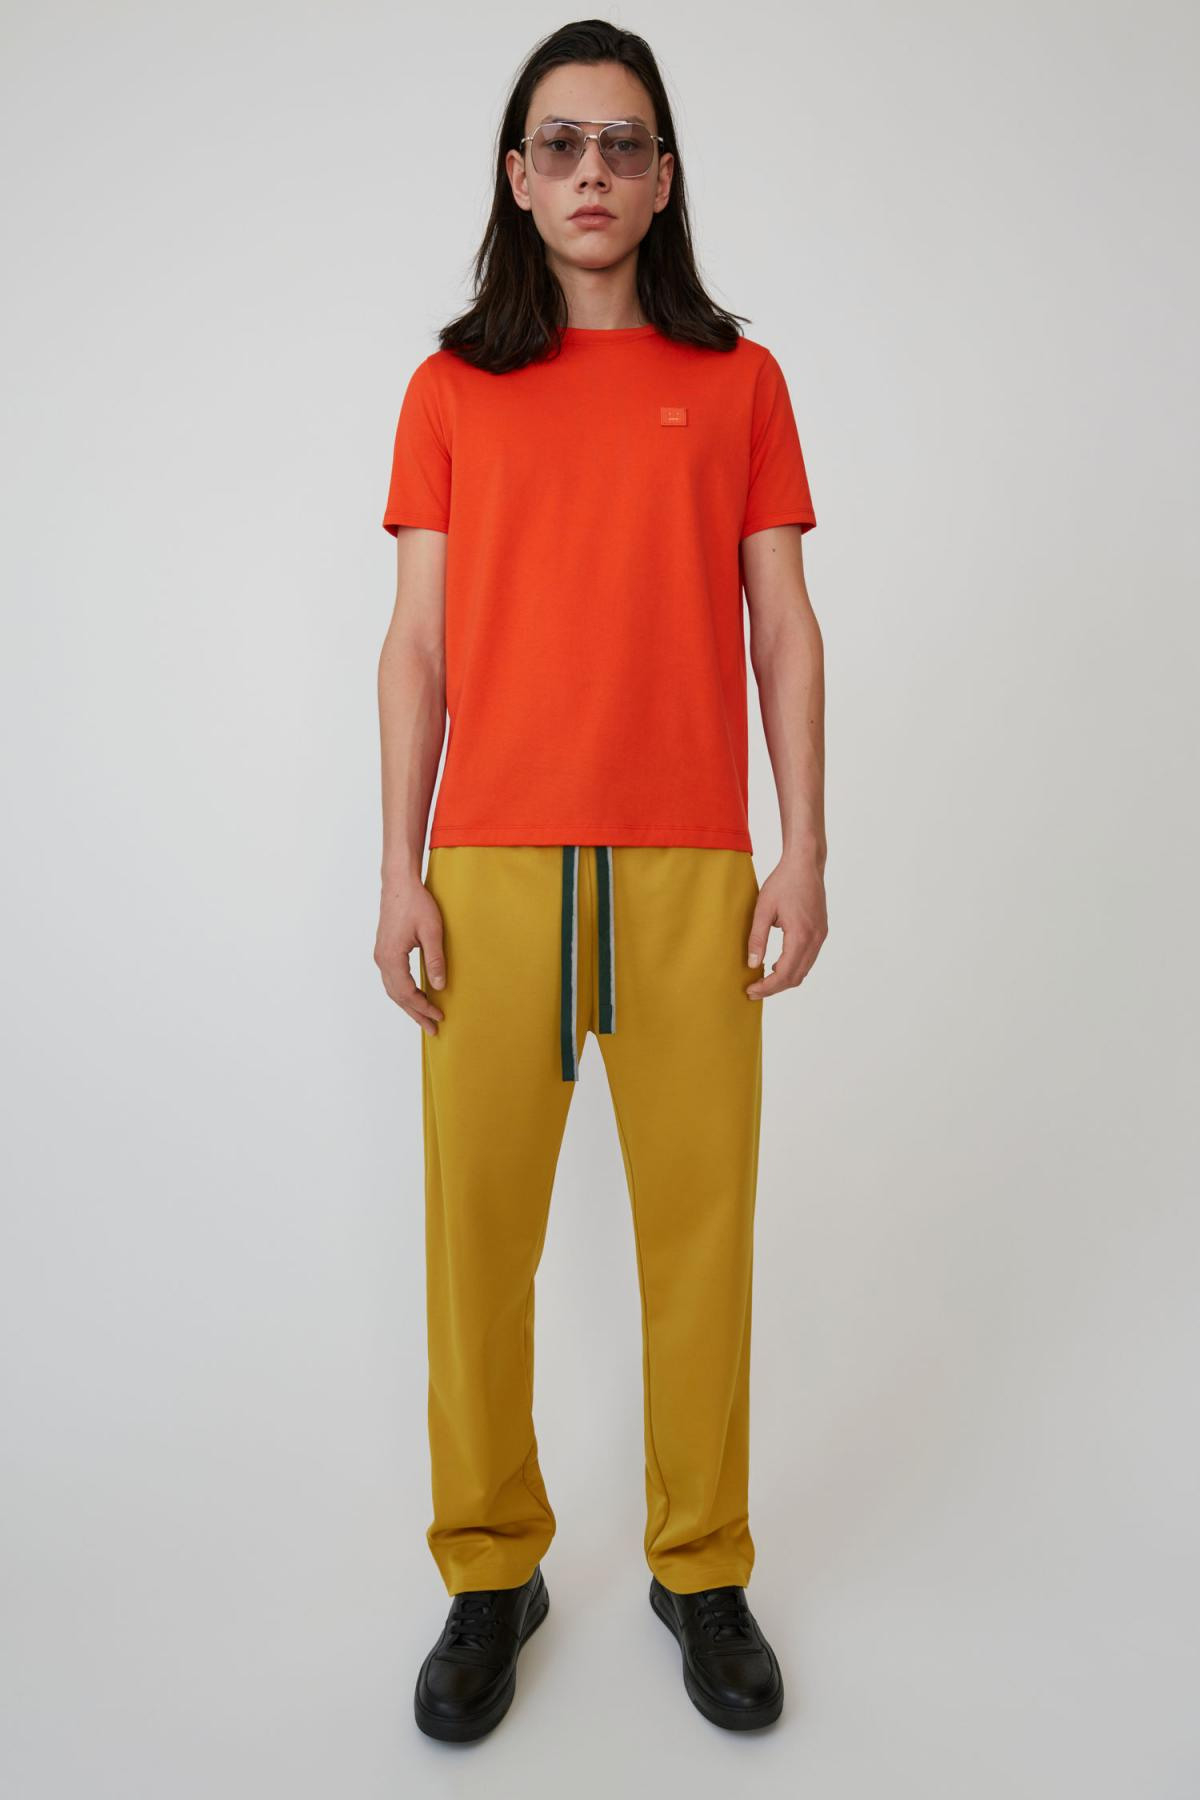 Damen Tshirts  Acne Studio Klassisches Tshirt Paprika